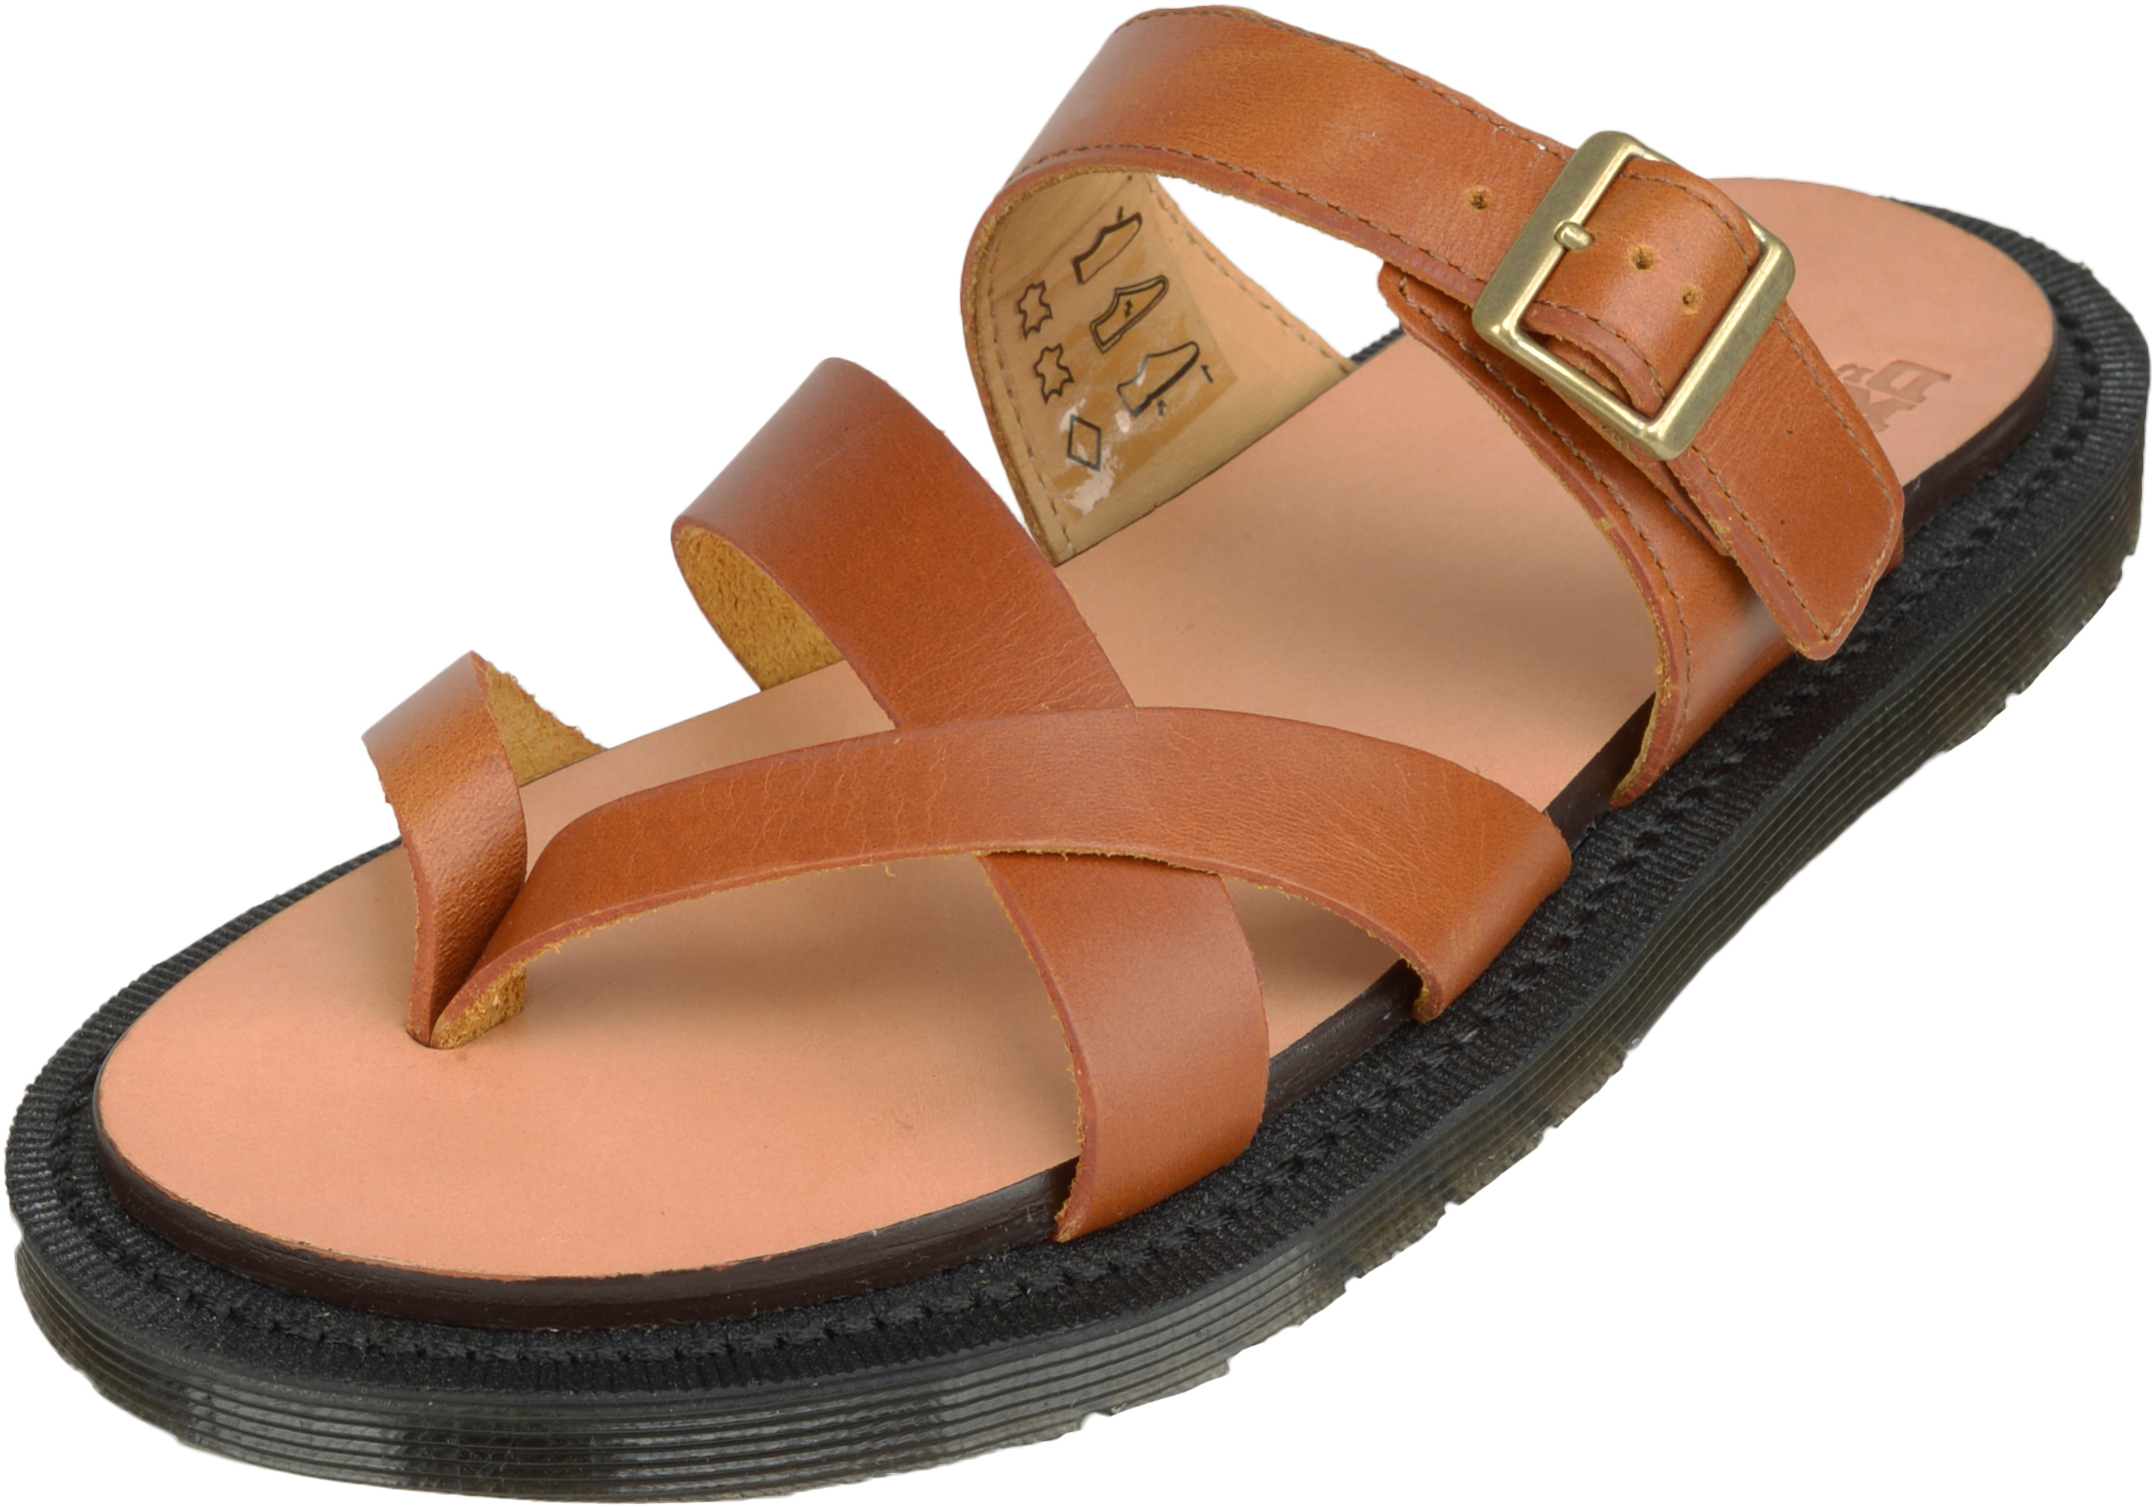 sneakers for cheap 1d349 ee91c Details zu Dr. Martens KASSY Semi Chromo Riemen Zehentrenner Camel SANDALEN